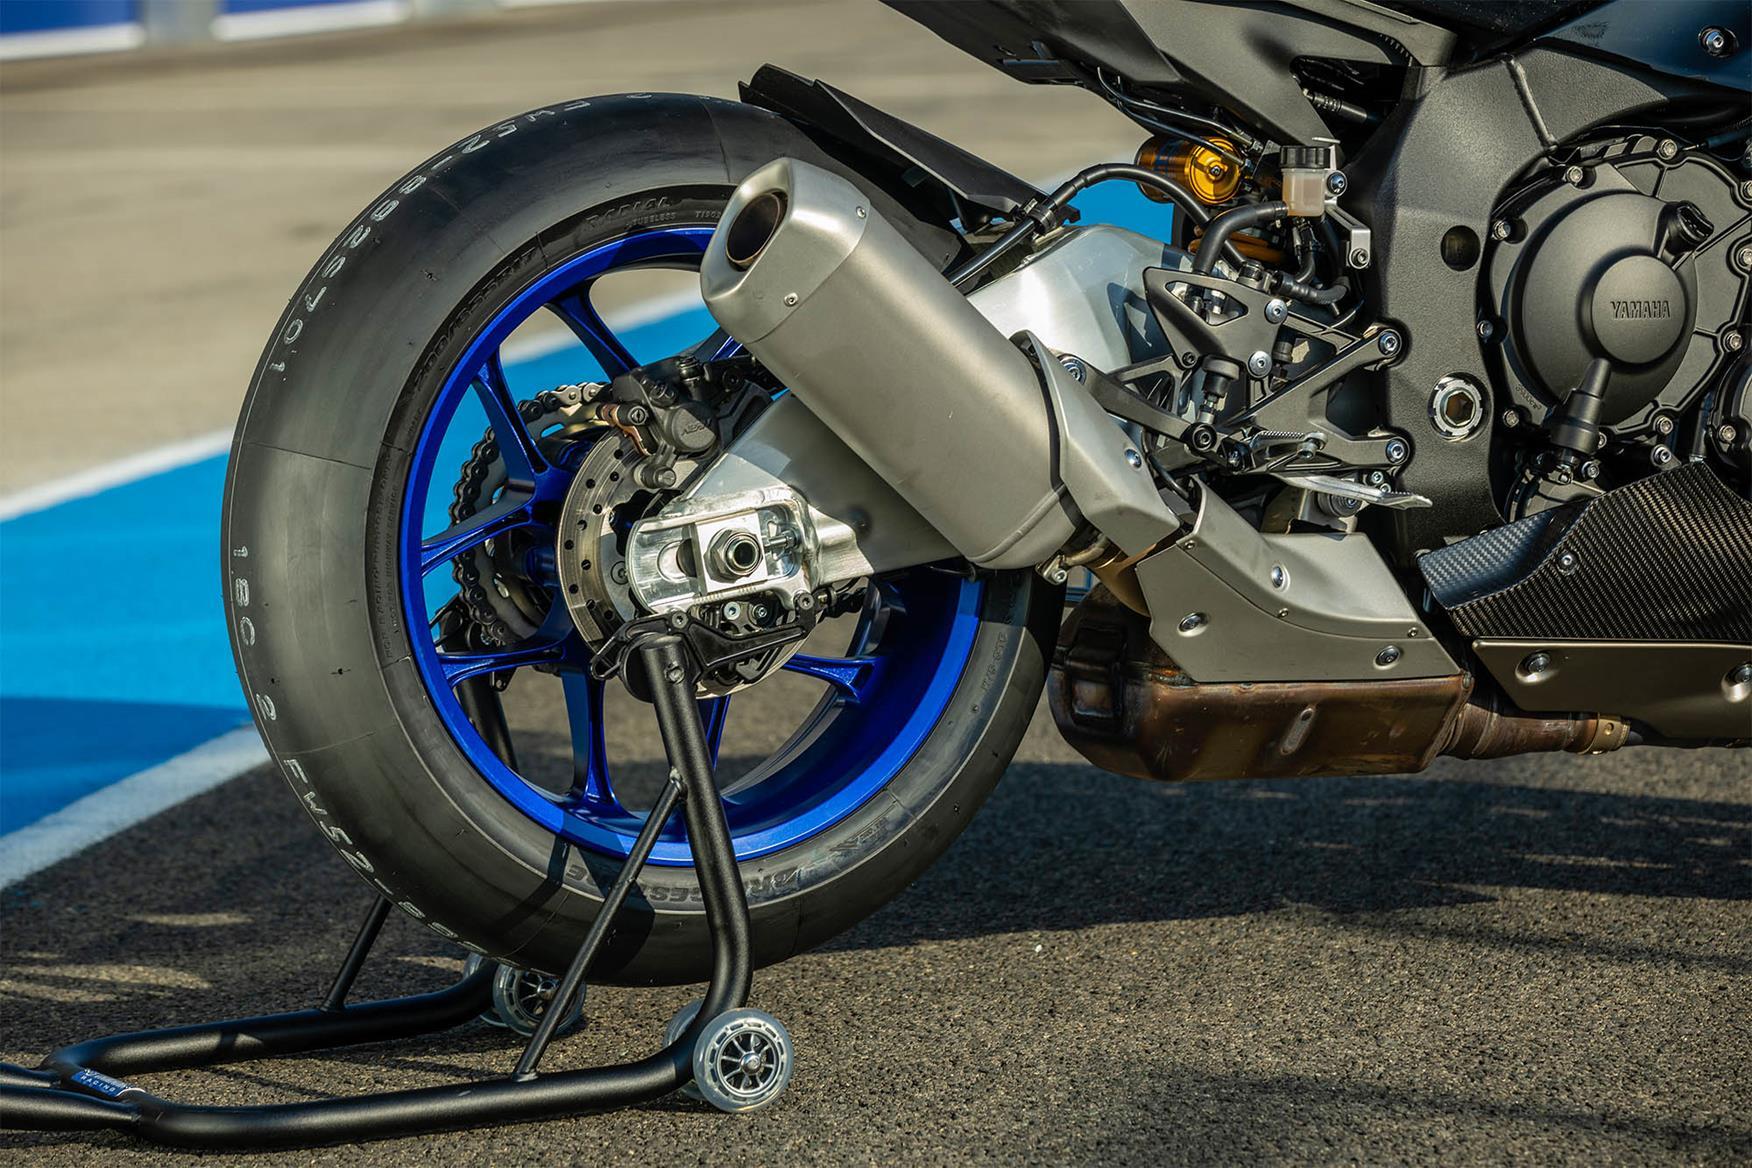 2020 Yamaha R1M swingarm